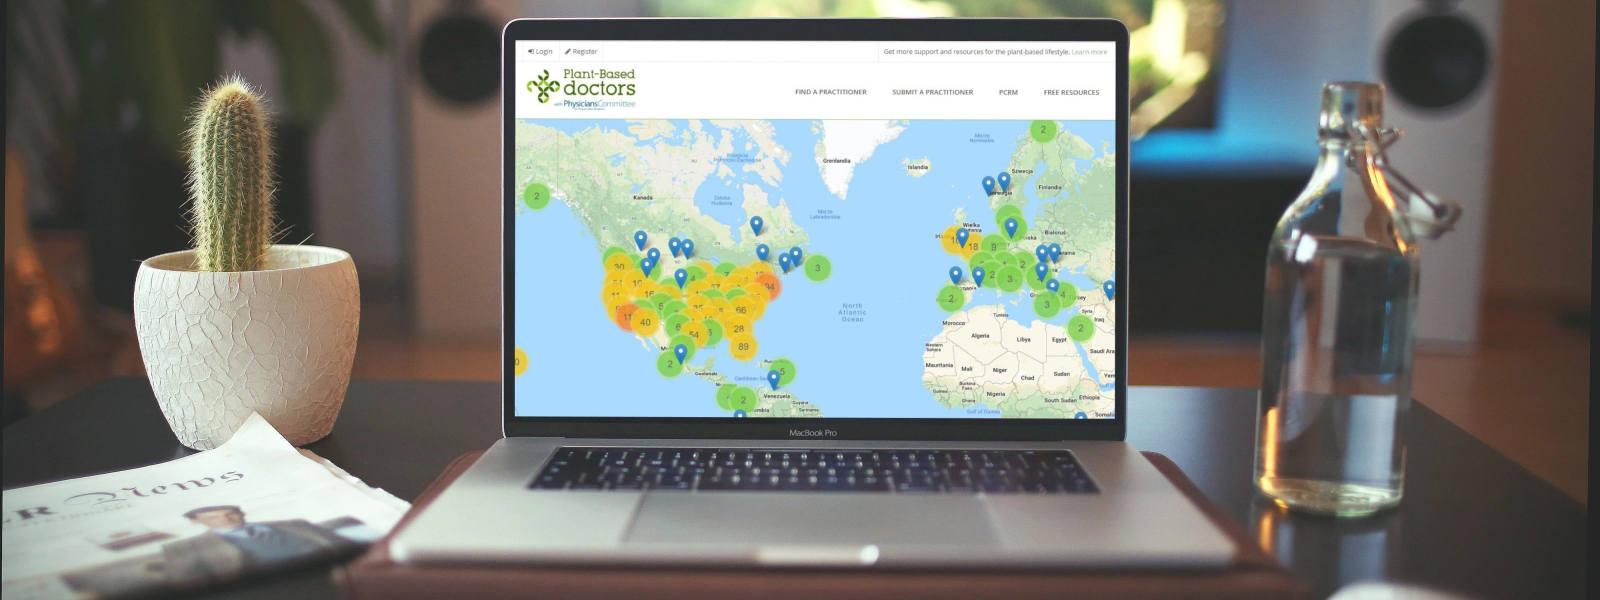 Laptop screen showcasing Plant-Based Doctors Directory website